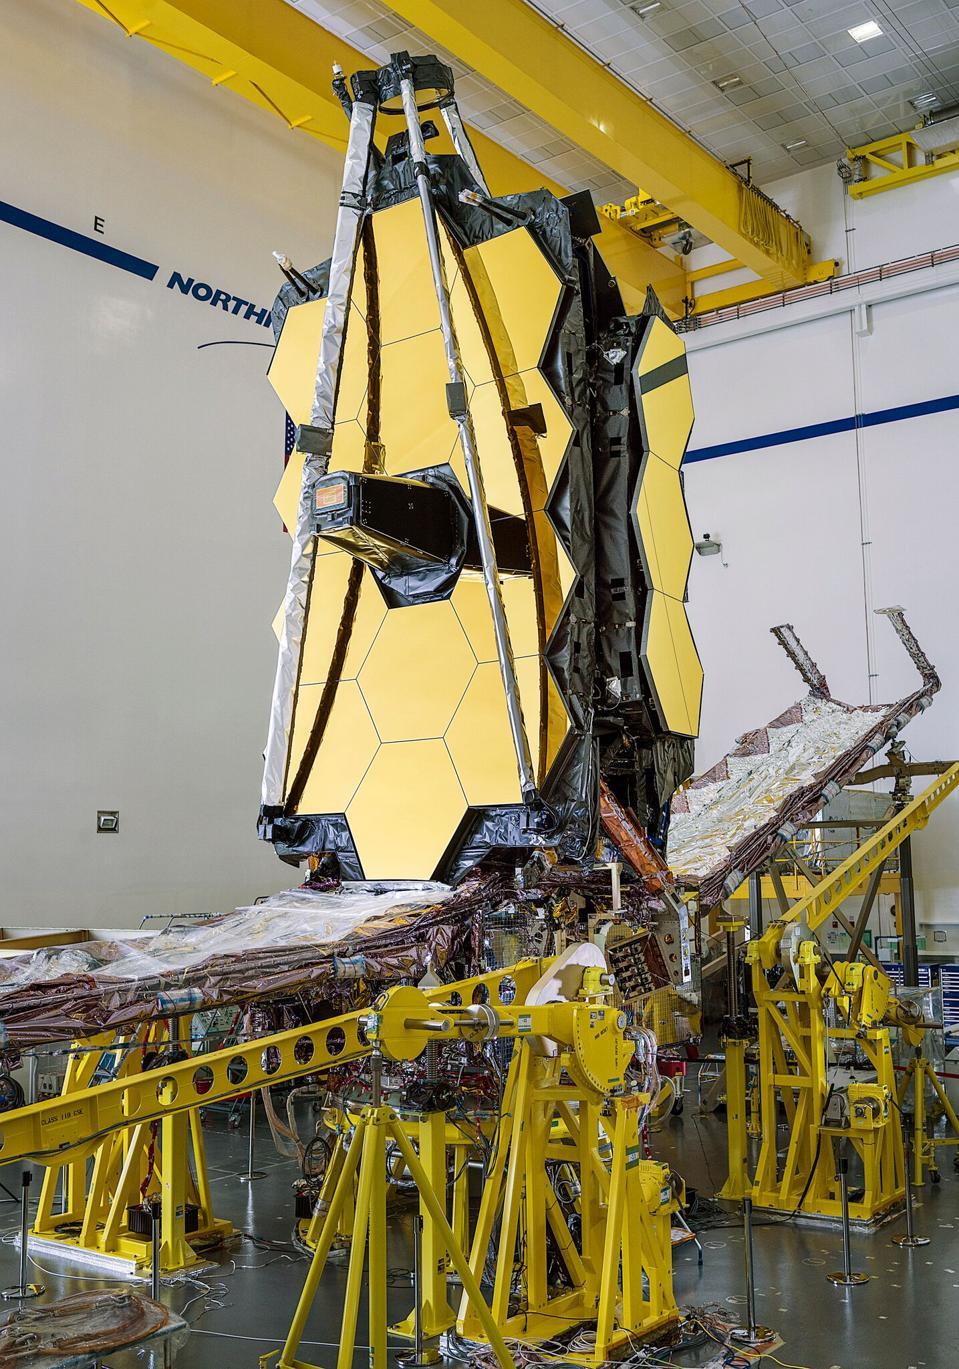 NASA's James Webb Space Telescope, post-integration, inside Northrop Grumman's cleanroom facilities in Redondo Beach, California.